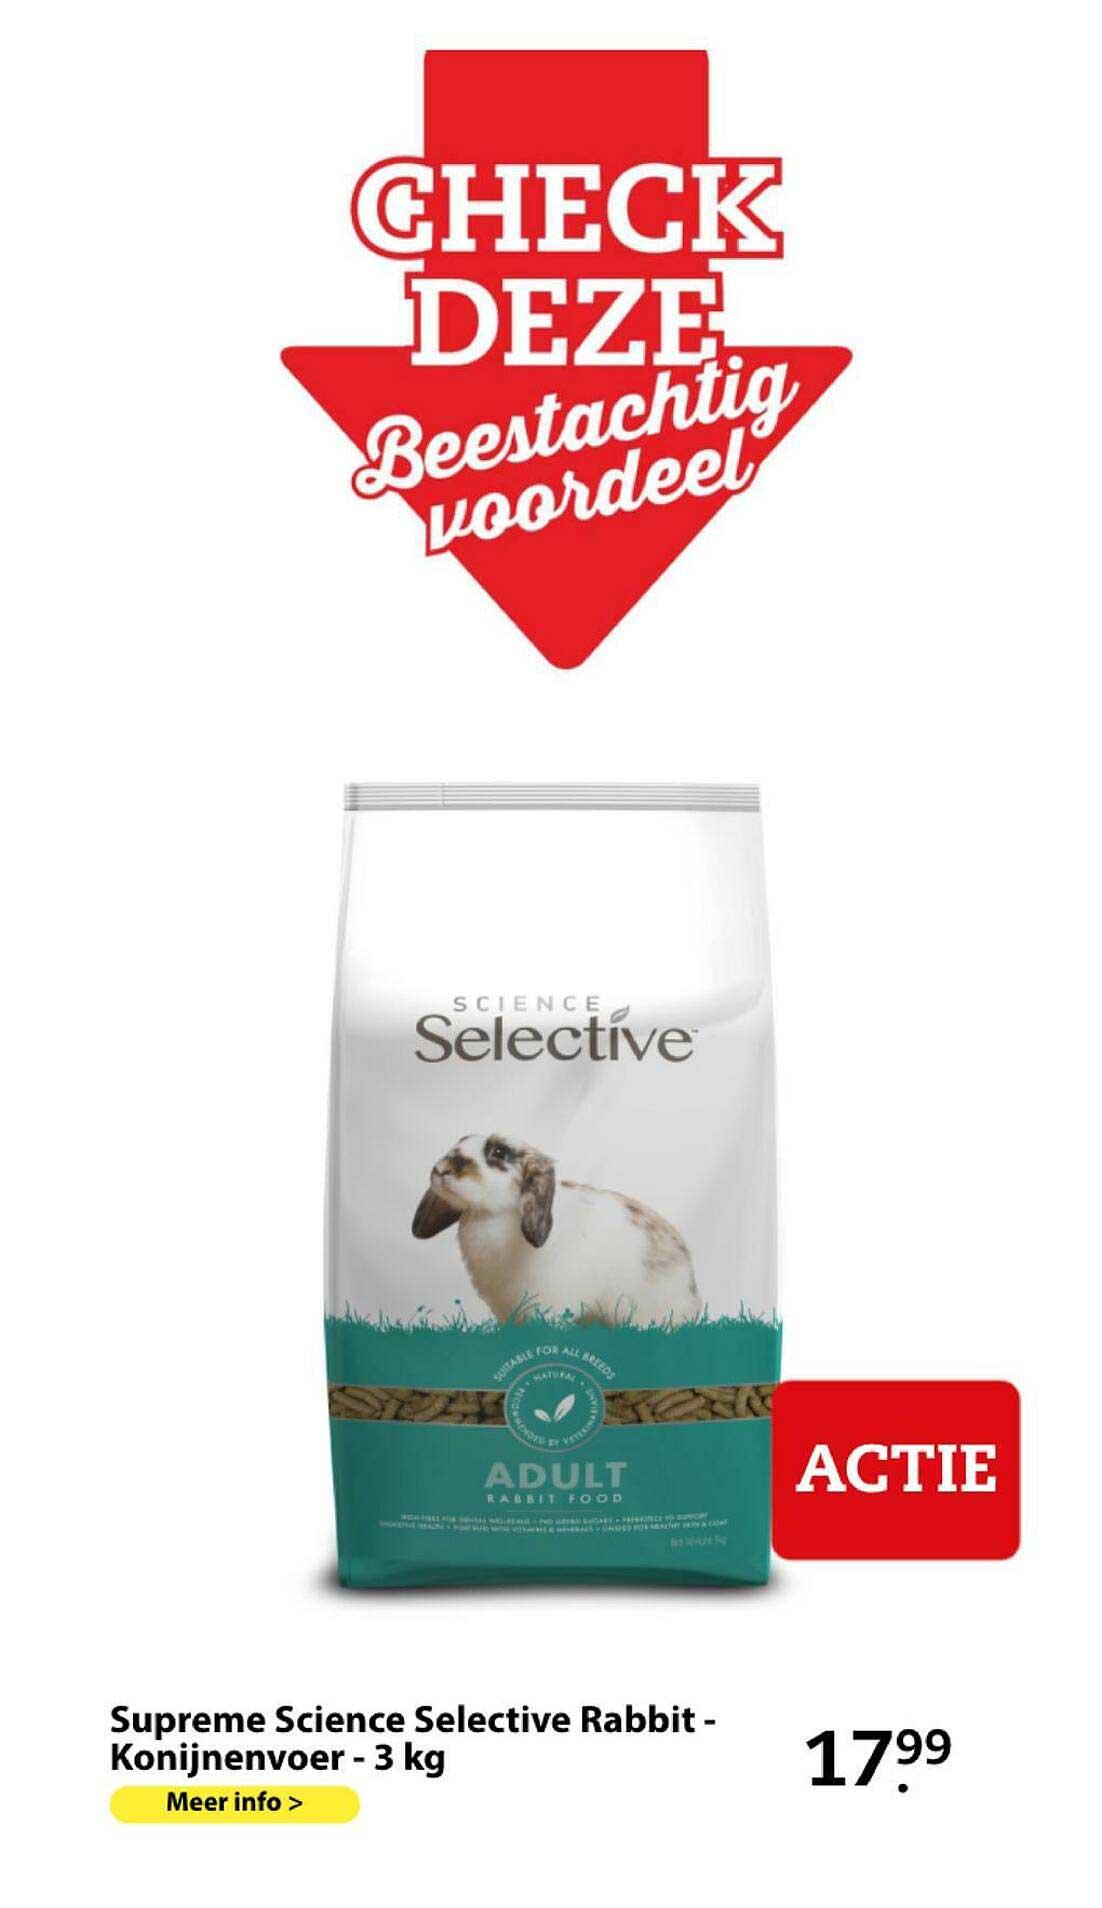 Boerenbond Supreme Science Selective Rabbit - Konijnenvoer - 3 Kg